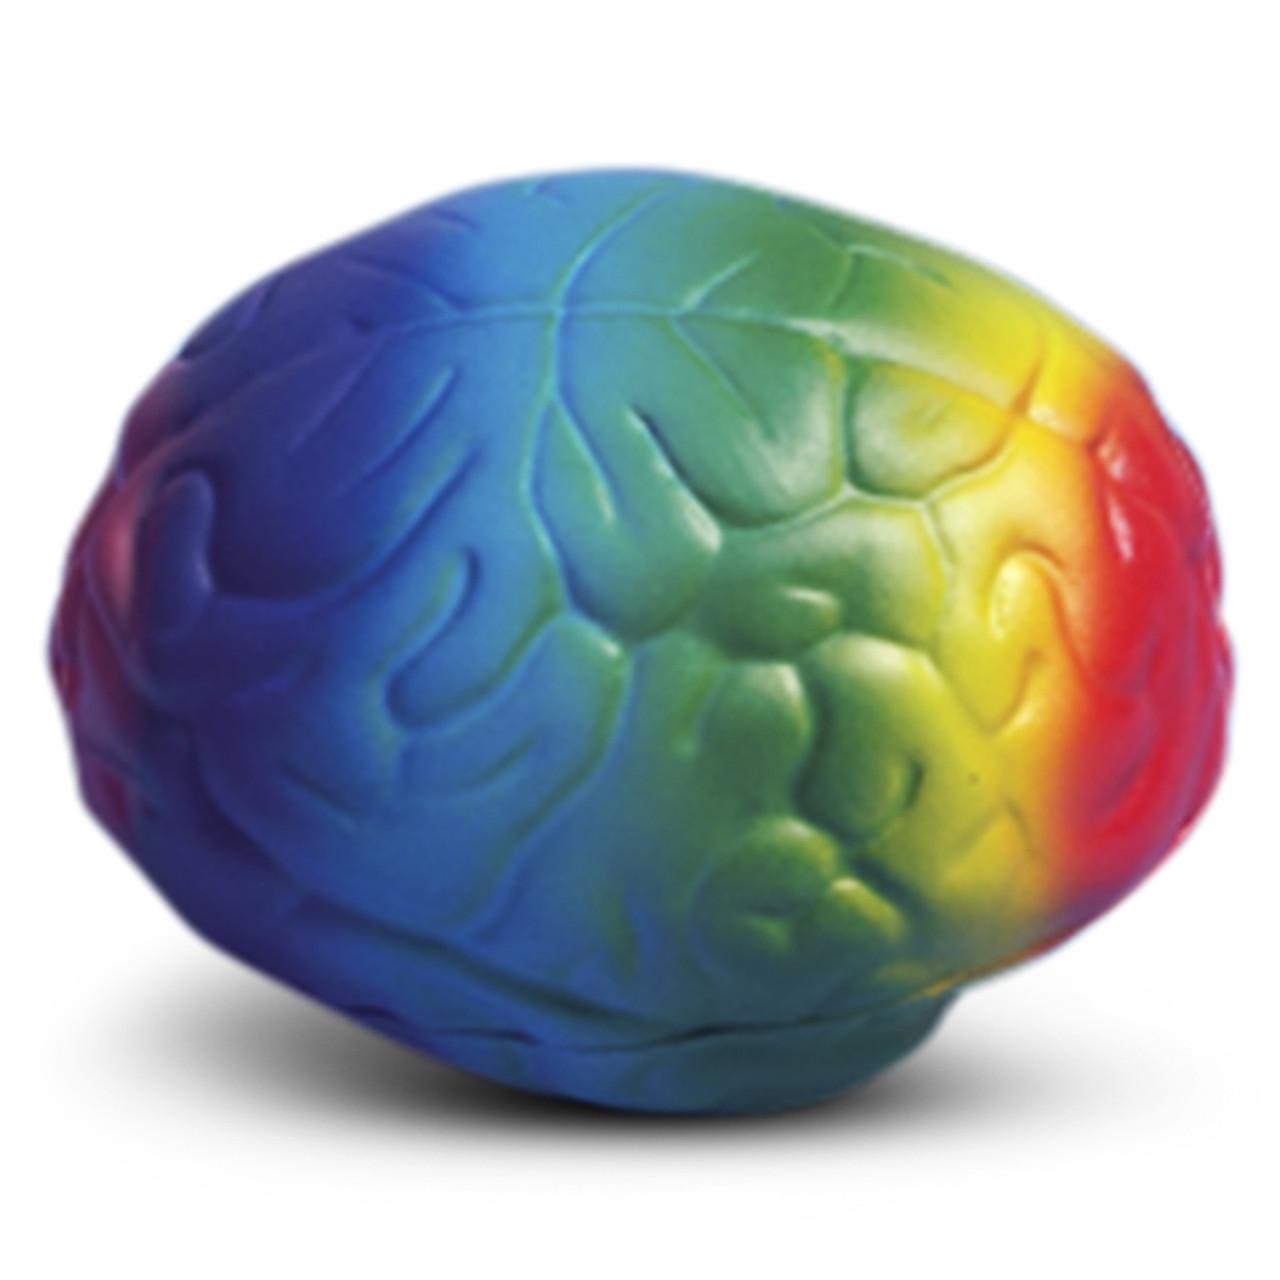 Brain Stress Ball - side view